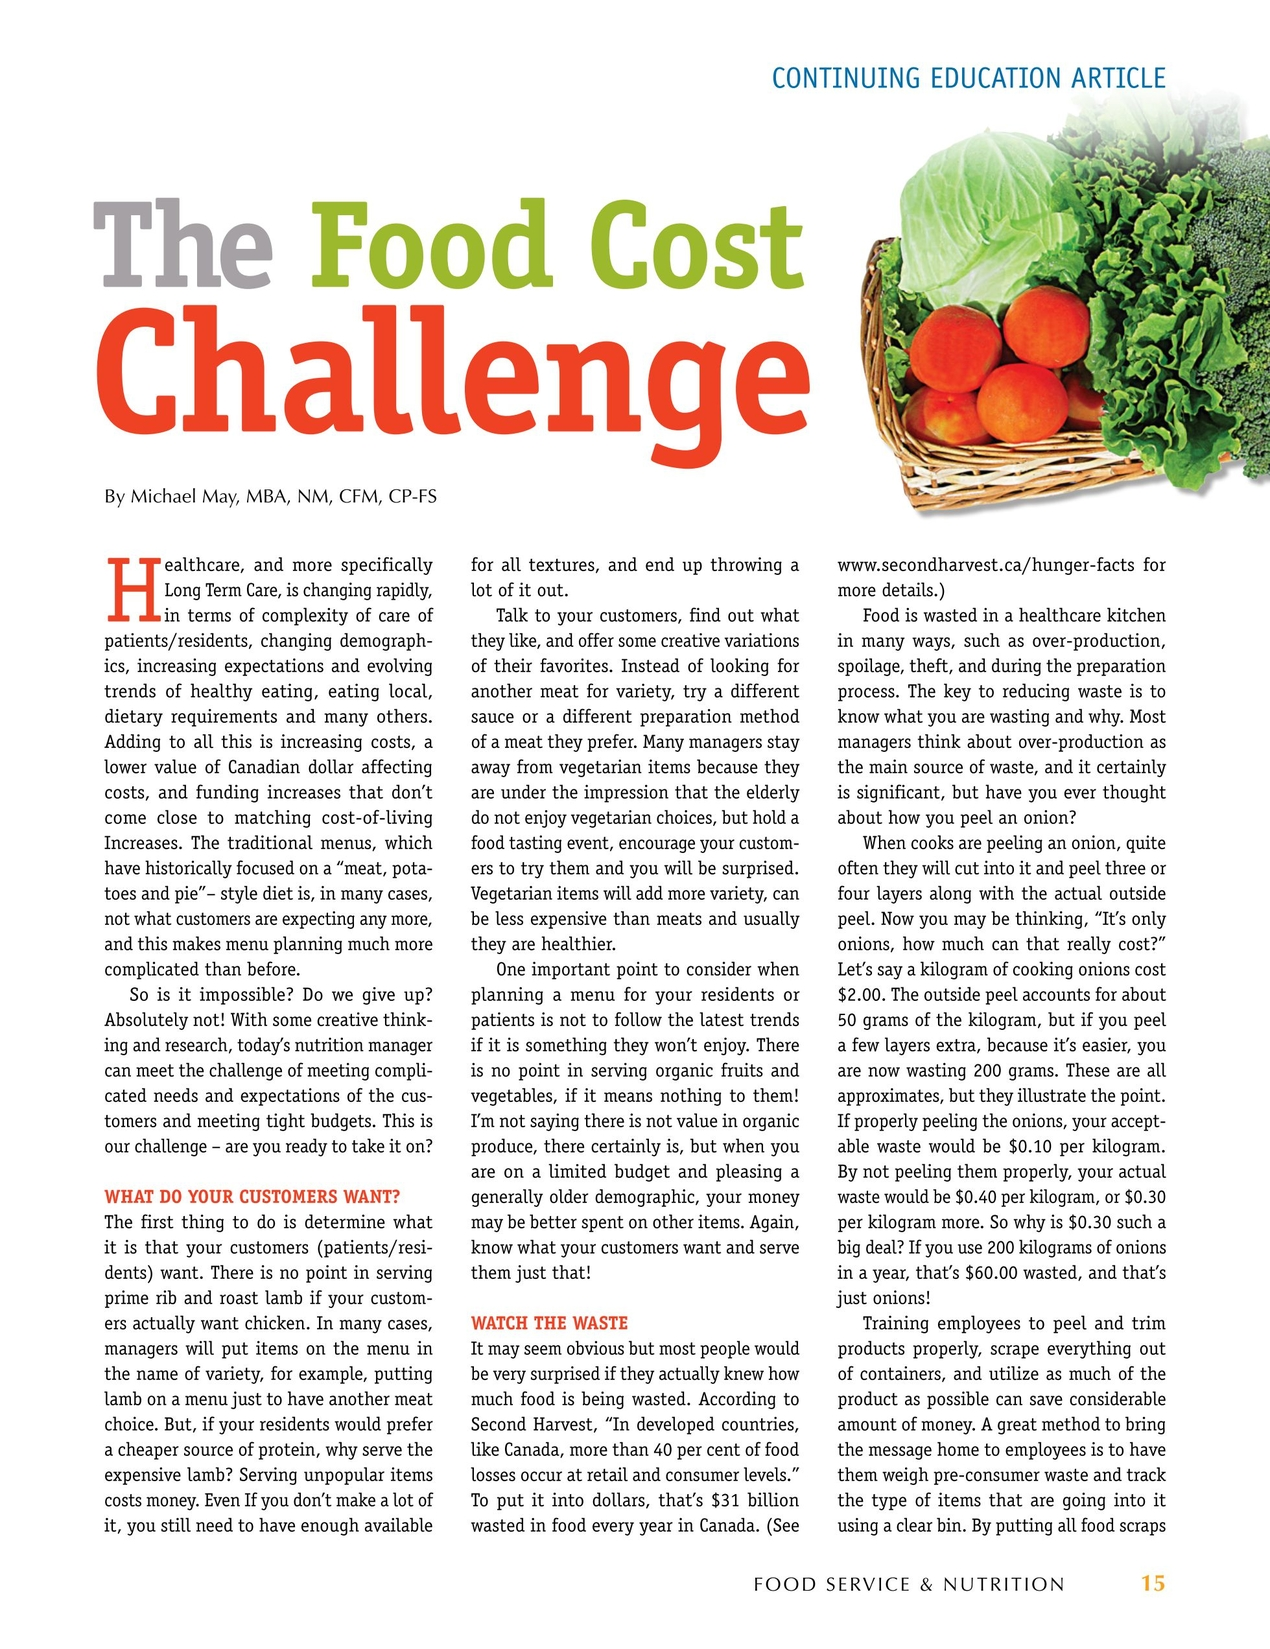 Food Service & Nutrition - Volume 1 No 1